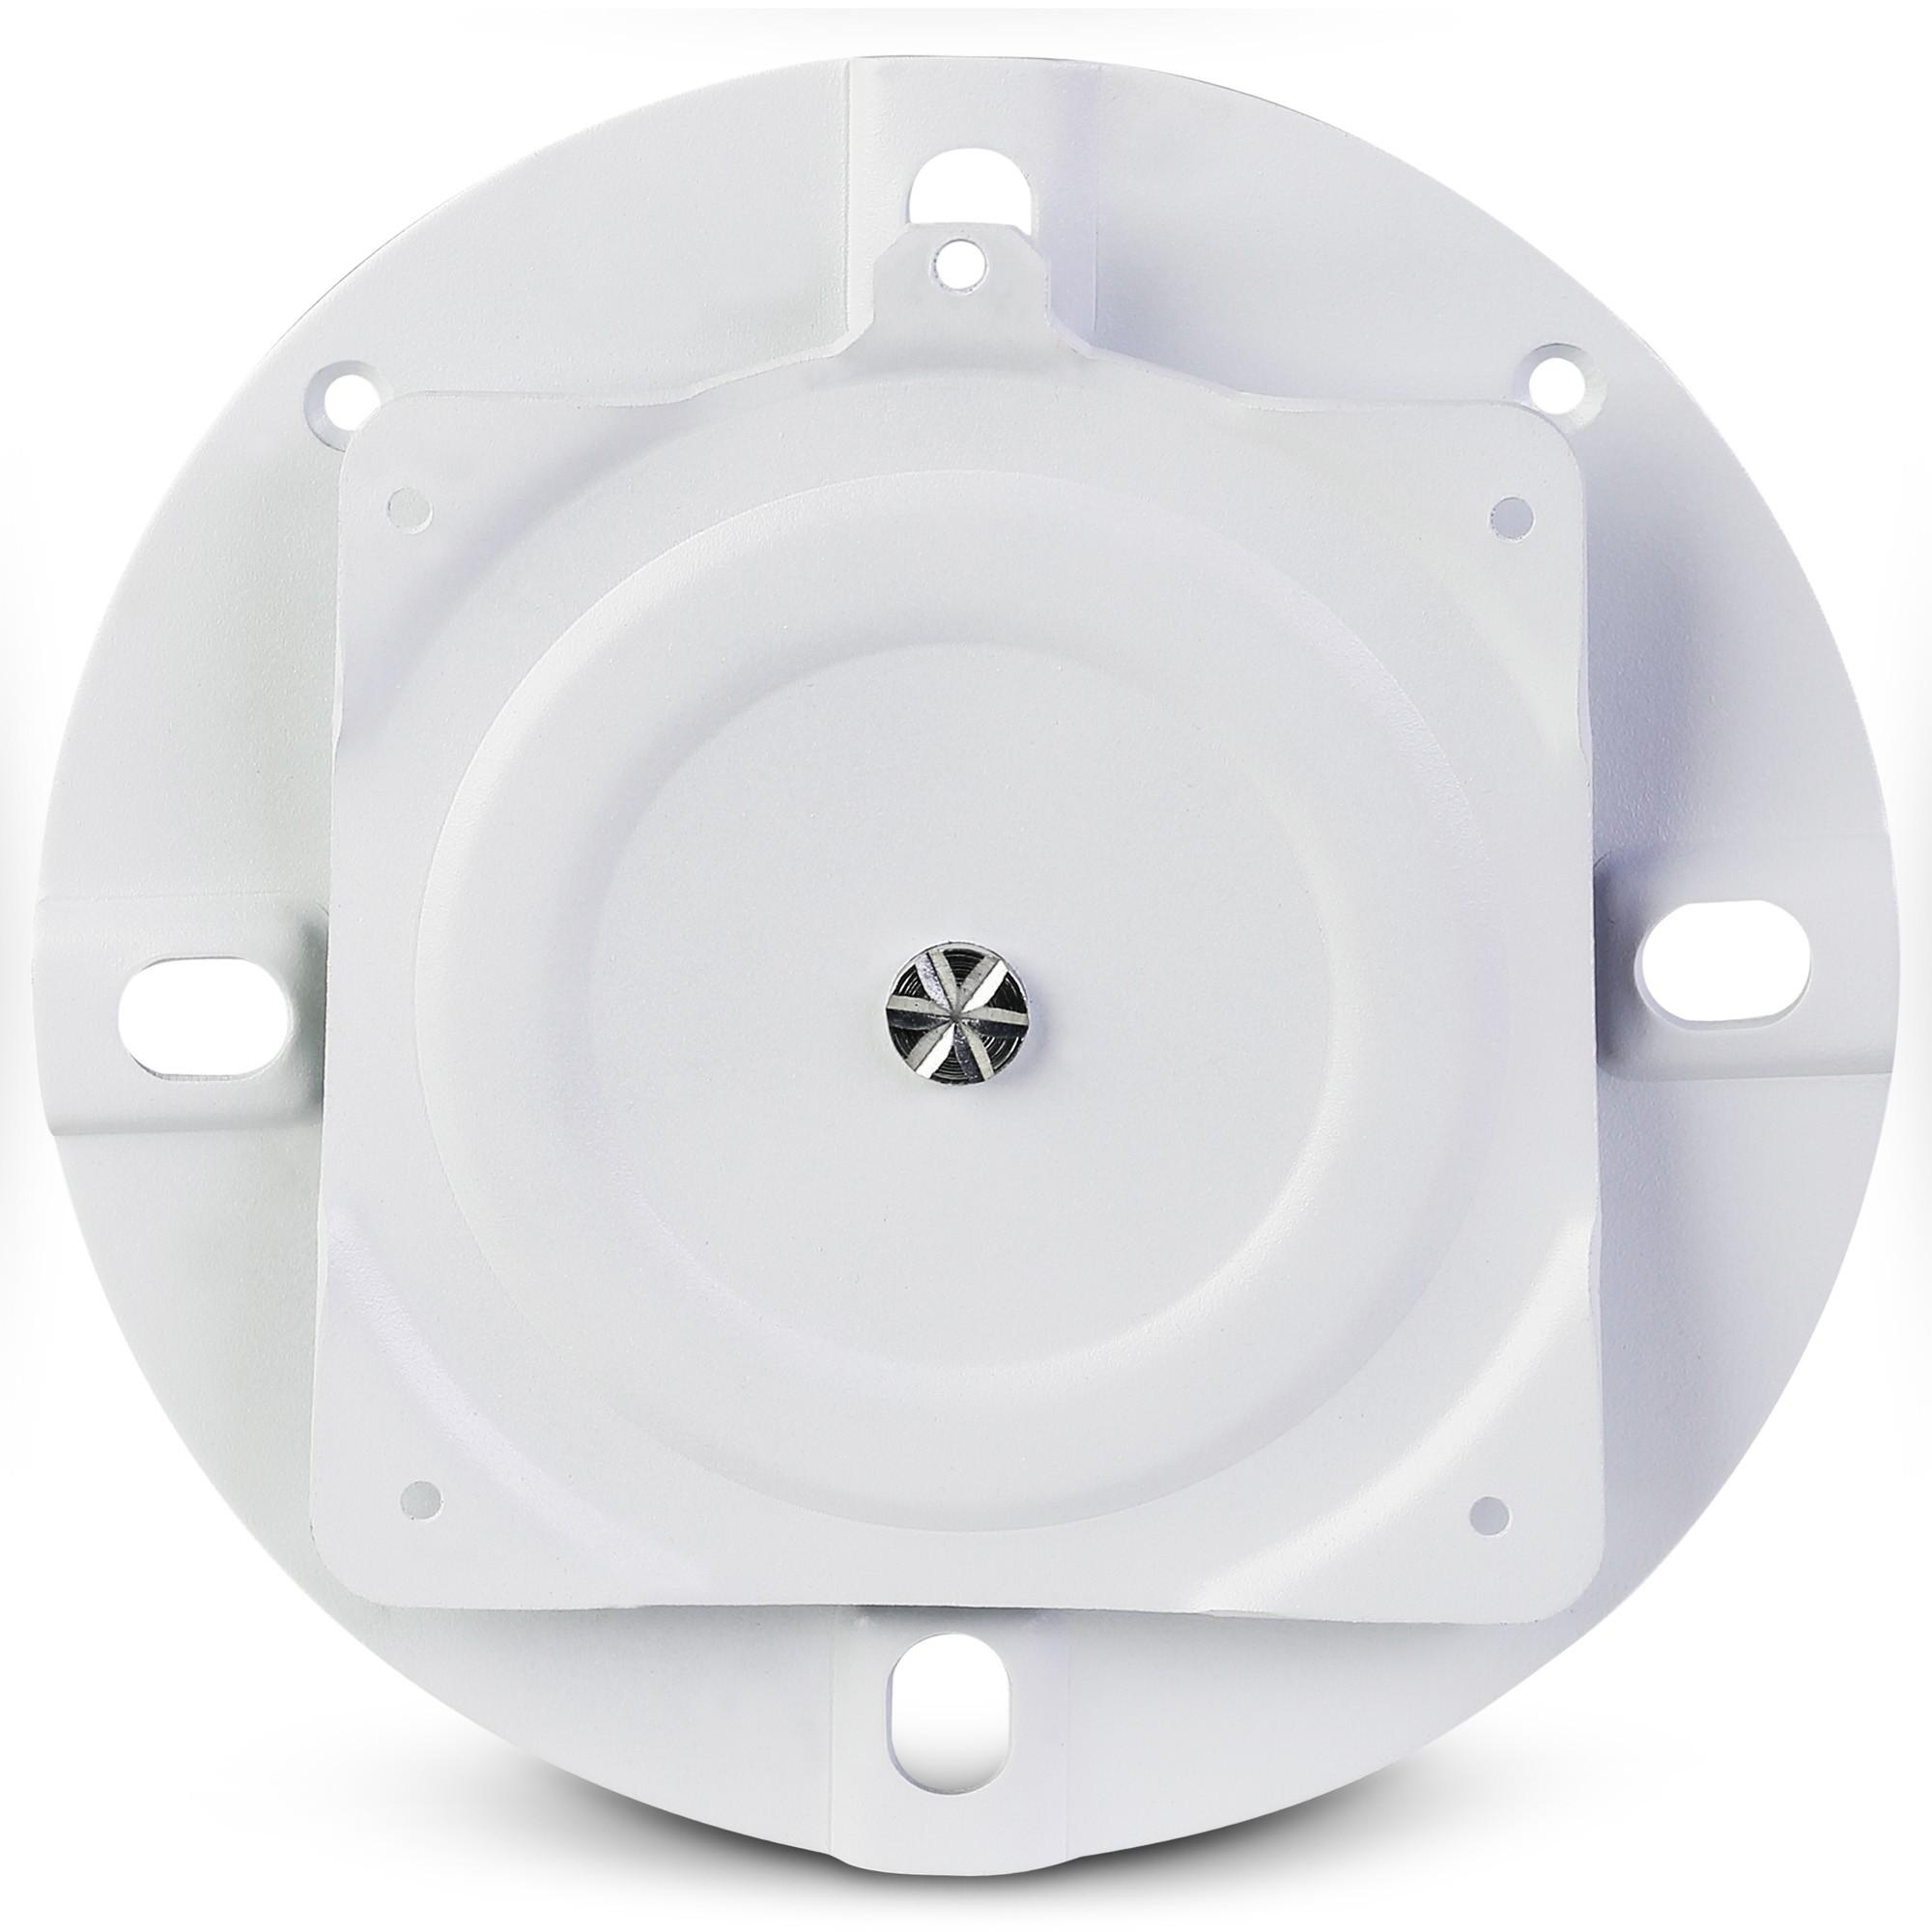 CURV 500 CMB W Support plafond pour satellites CURV 500®, blanc